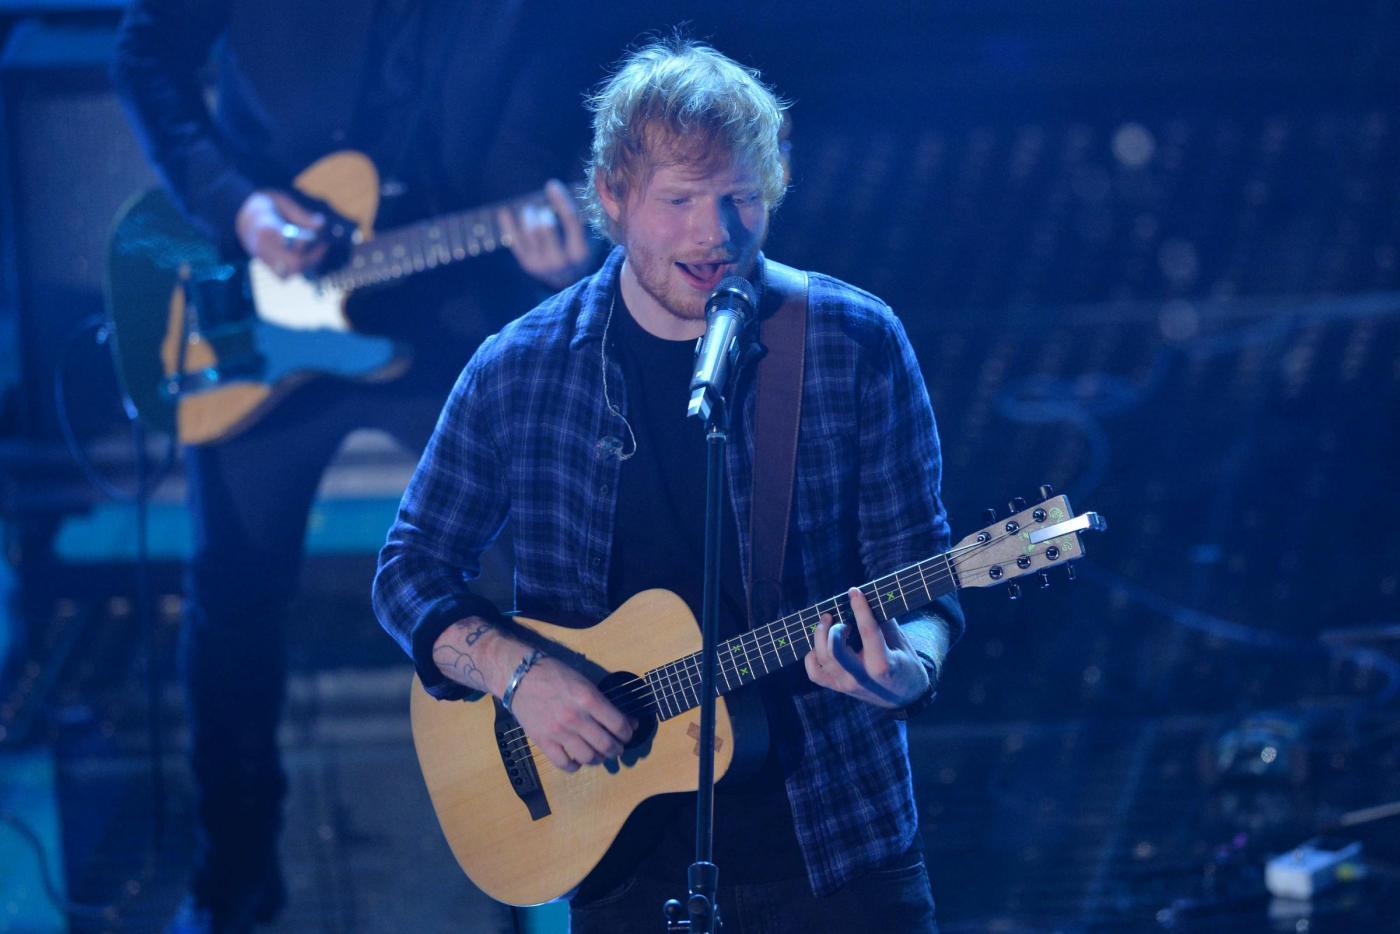 Ed Sheeran a Sanremo 2015 con Sing e Thinking Out Loud